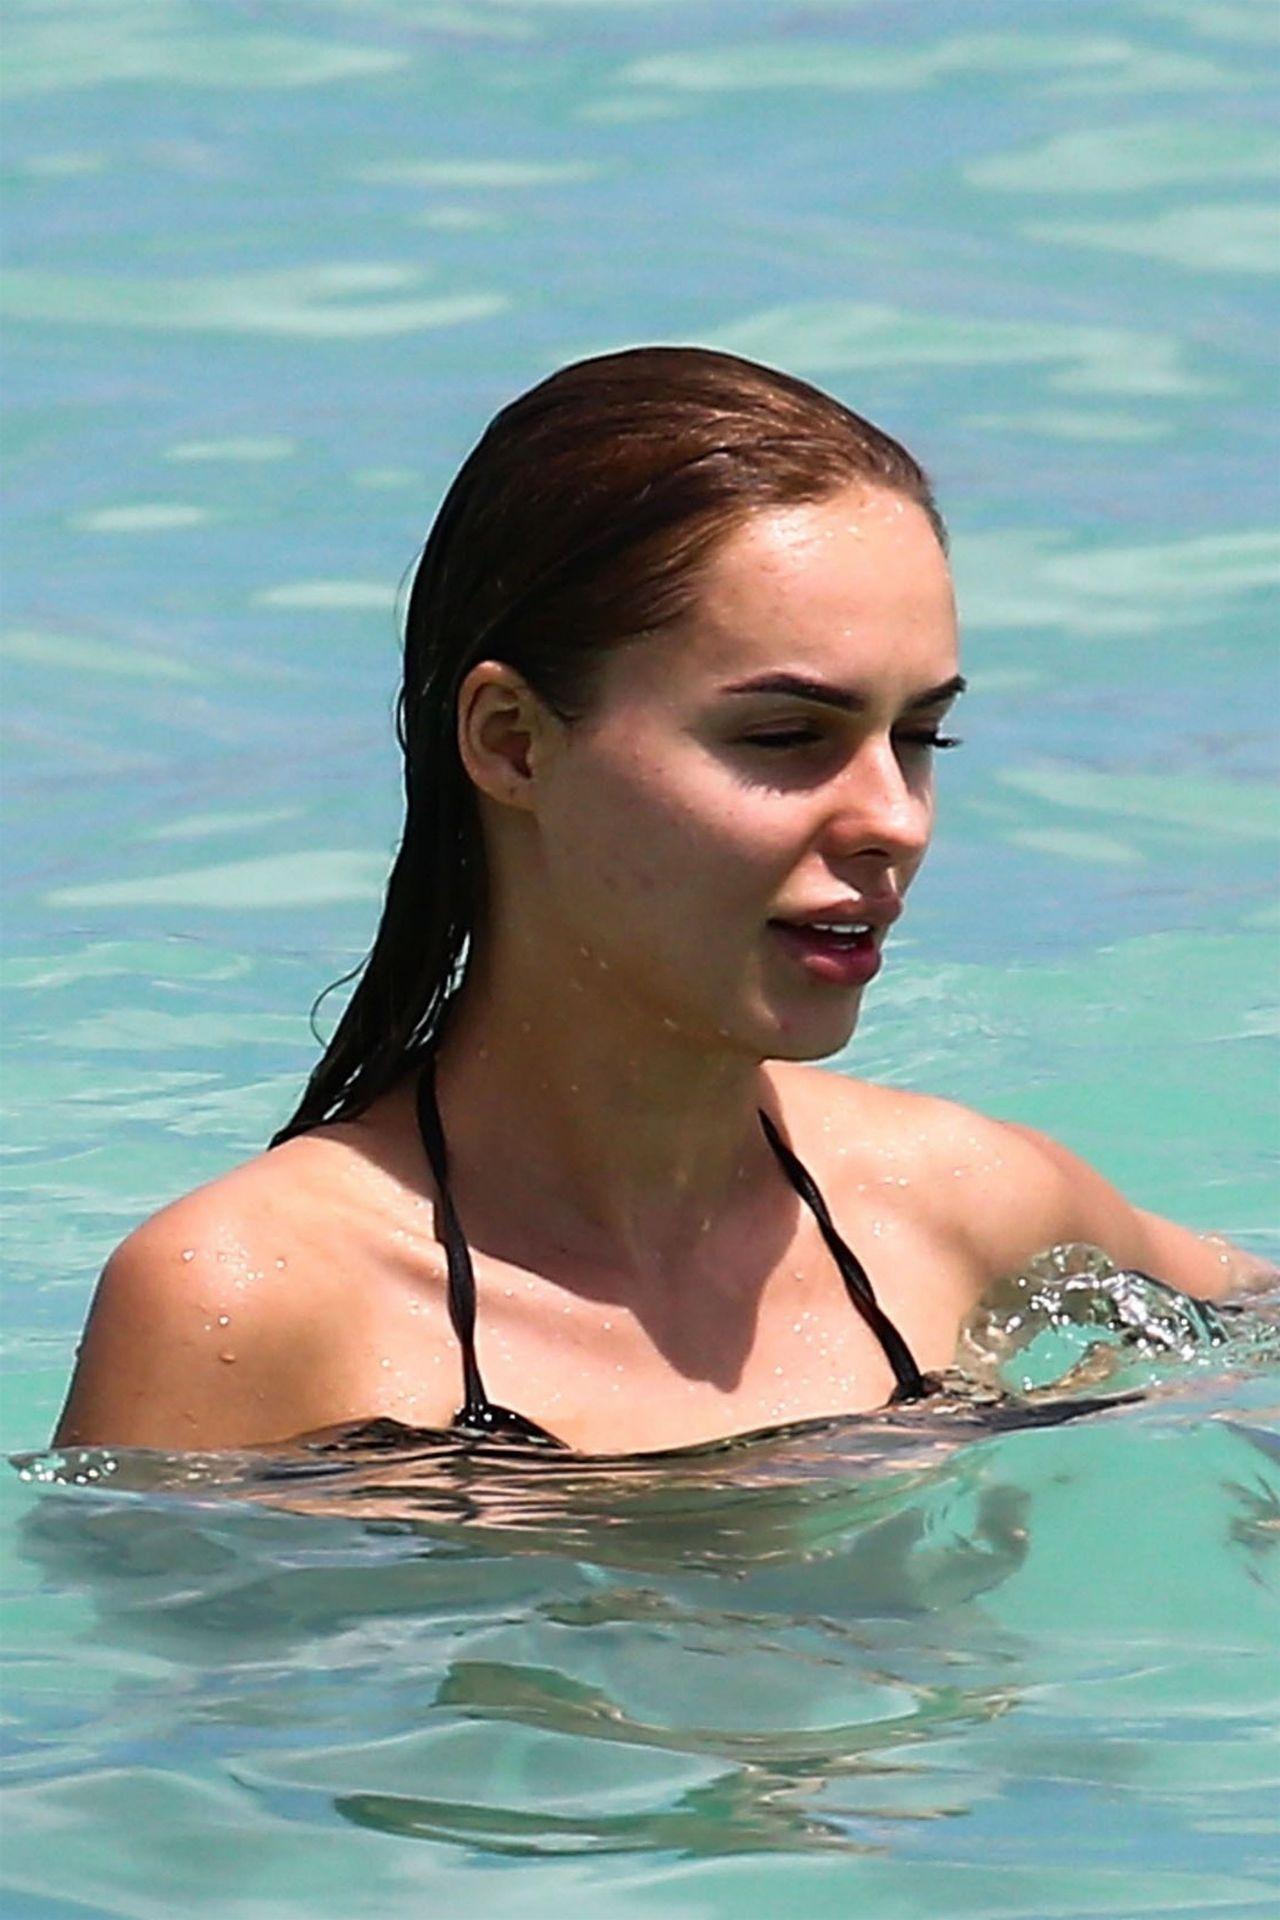 Tits Hanna Ivanova  nude (65 pictures), Snapchat, braless